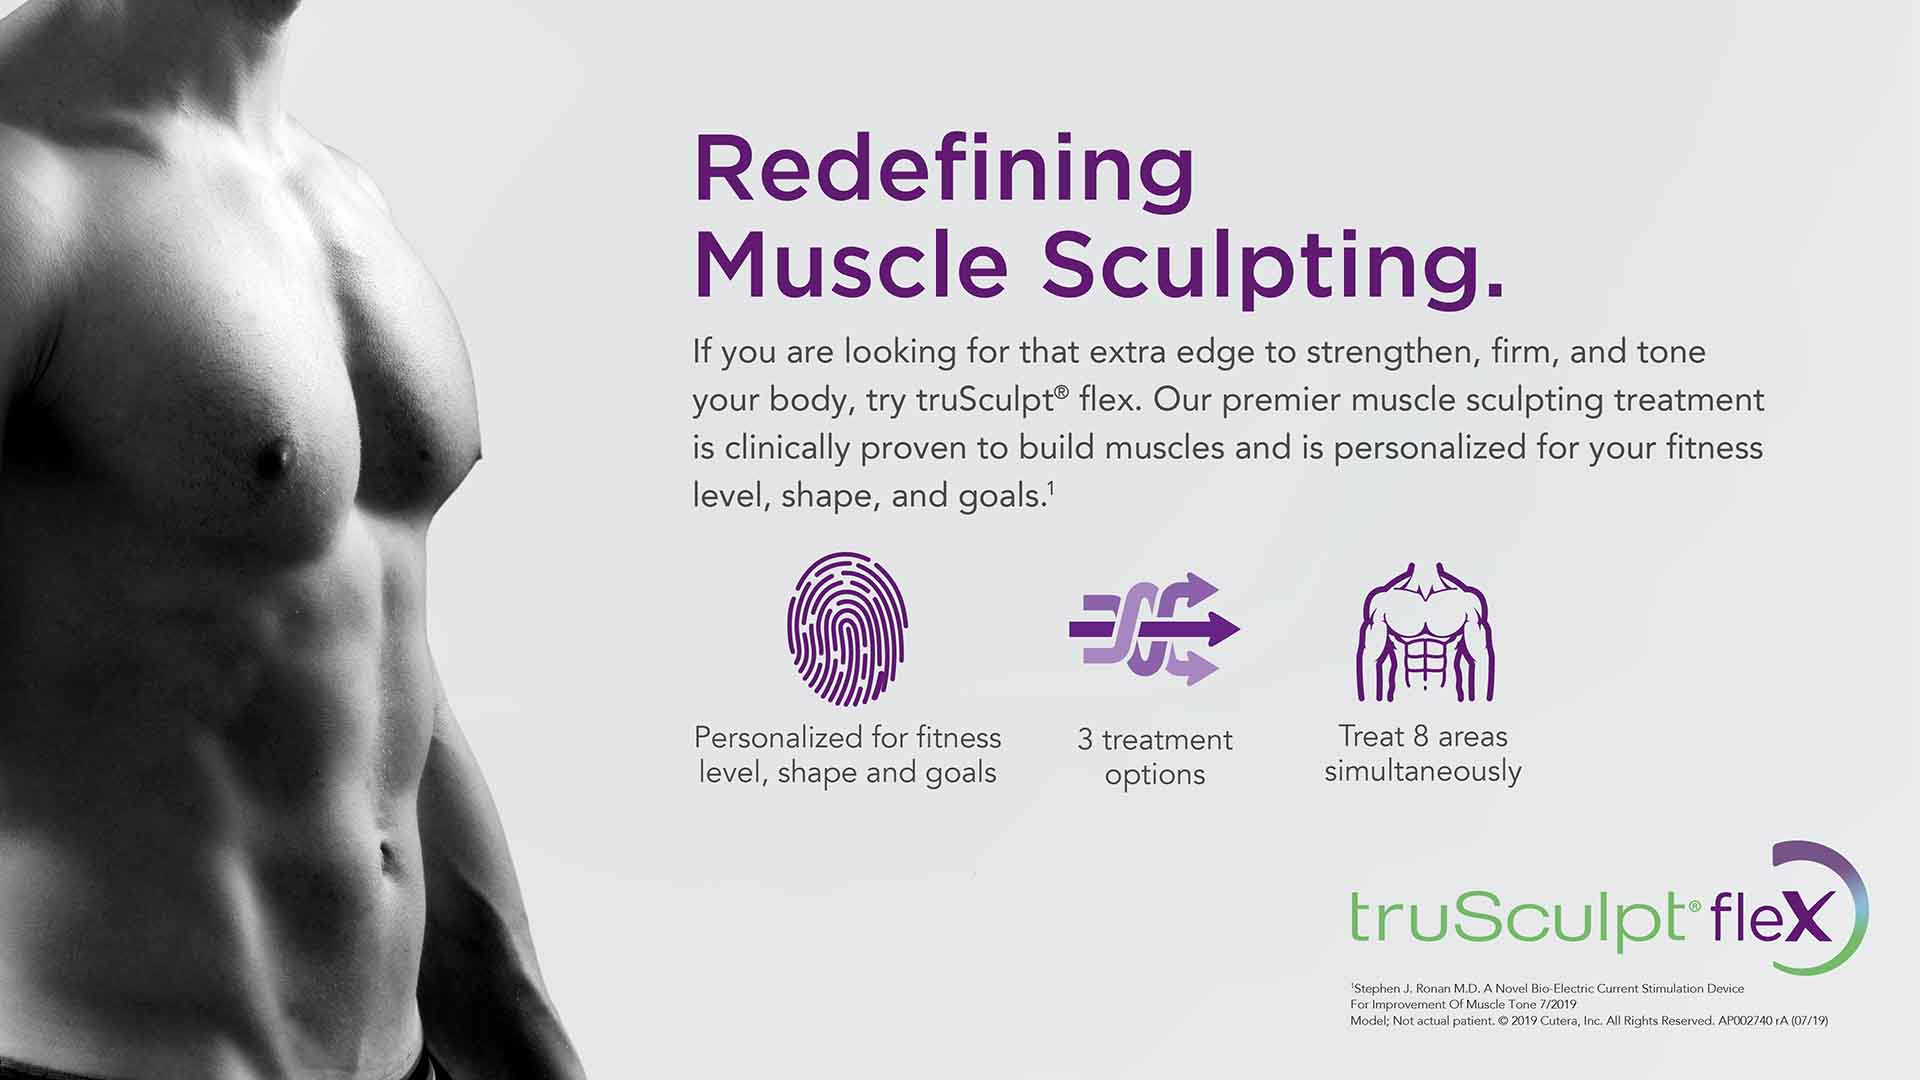 truSculpt flex muscle sculpting